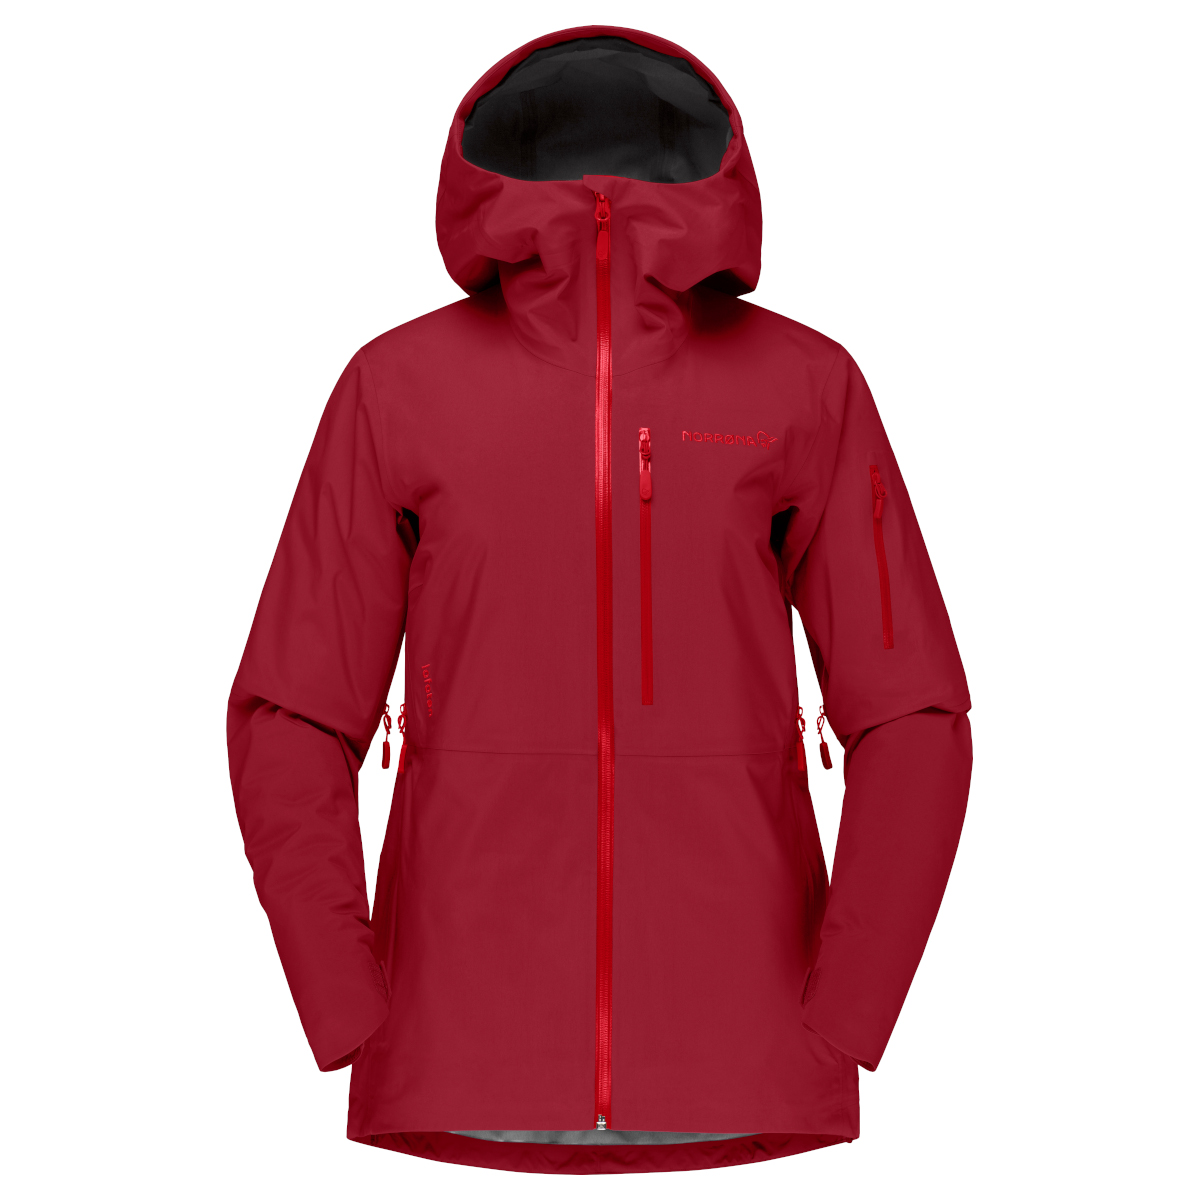 Norrona lofoten Gore-Tex Jacket Women - Rhubarb